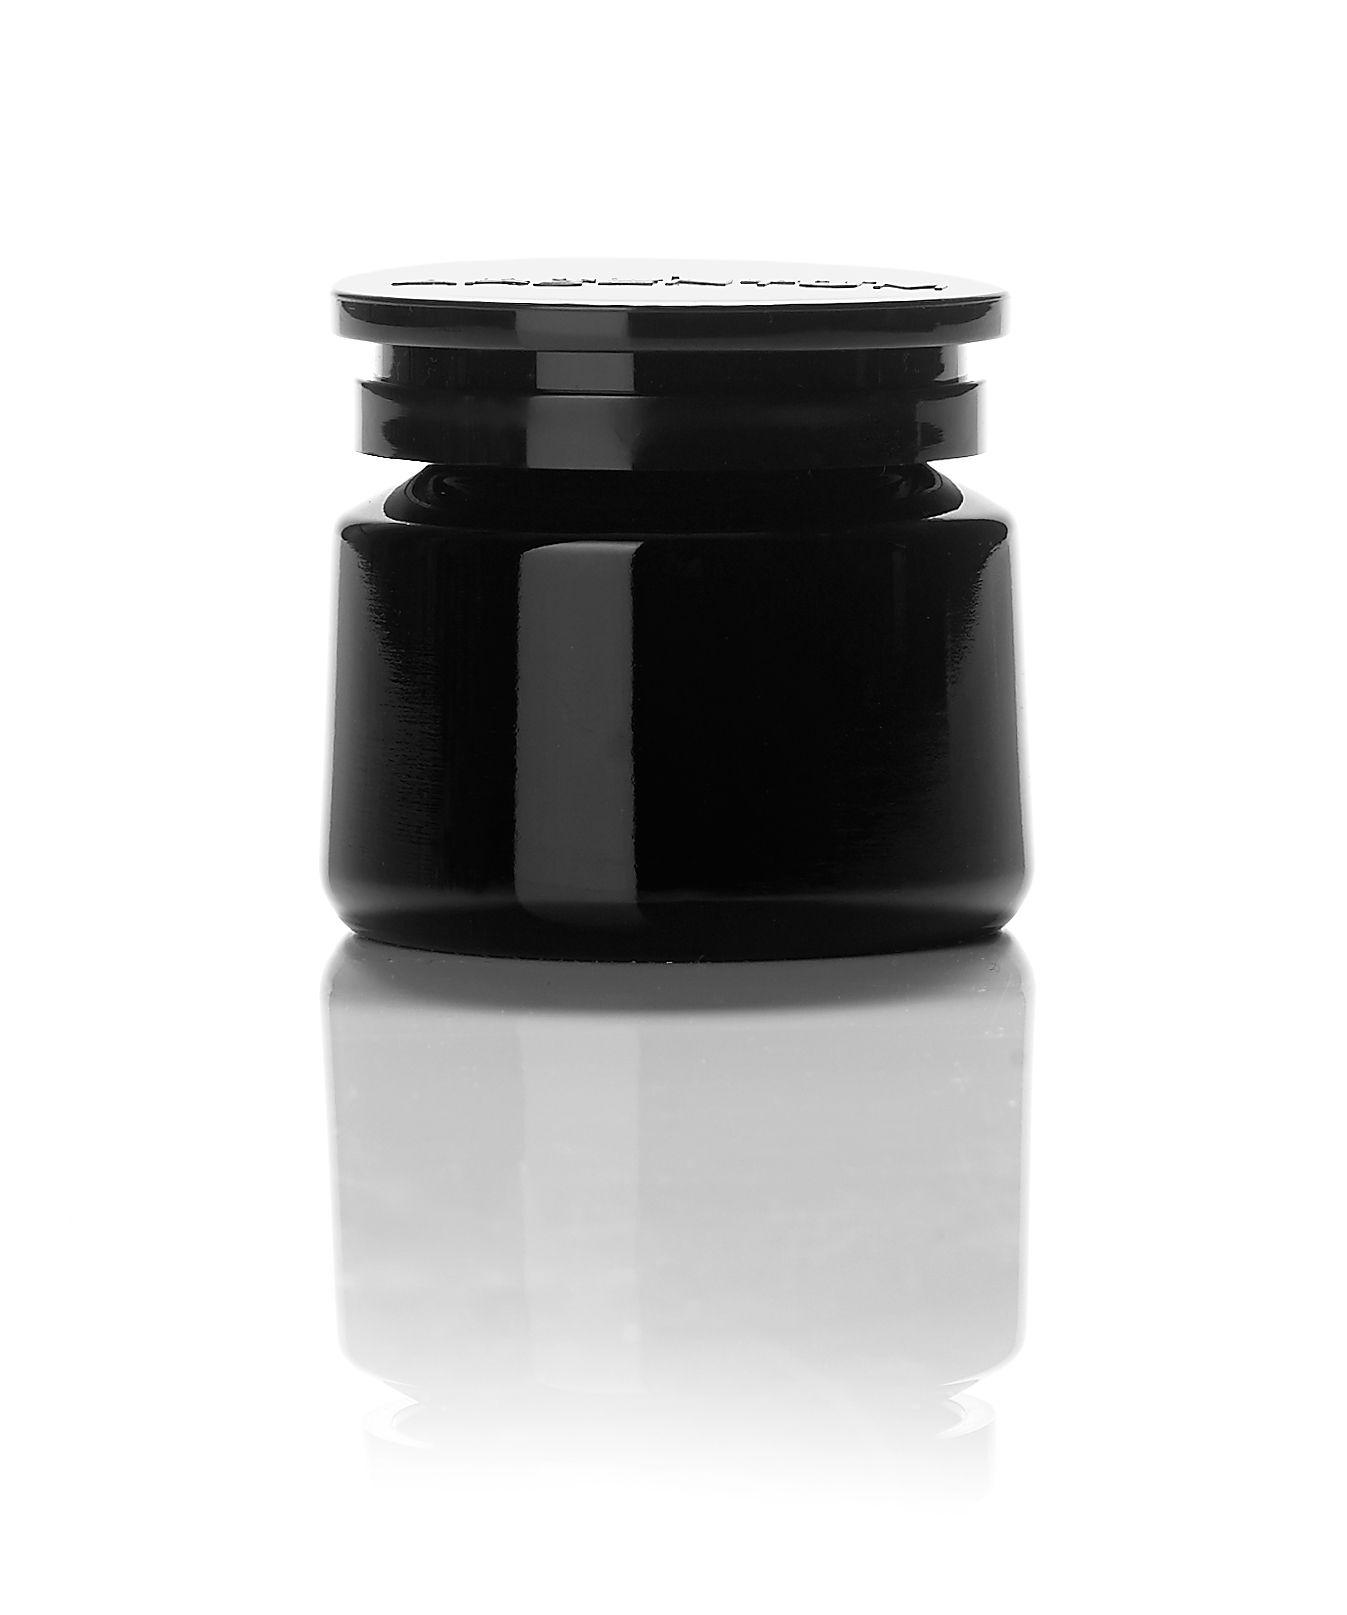 ARgENTUM Hydrating Restorative Anti-Age Cream 70 ml #lapotioninfinie #jar #black